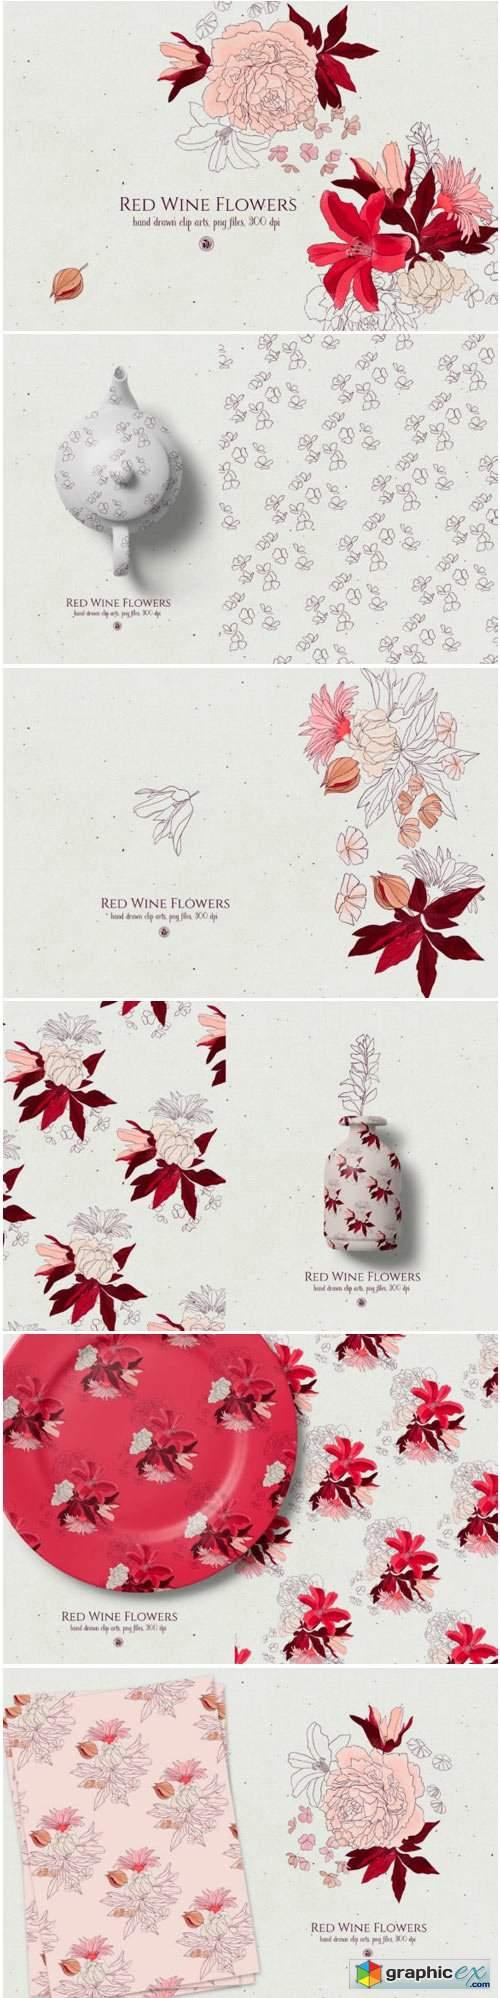 Red Wine Flowers 1736662